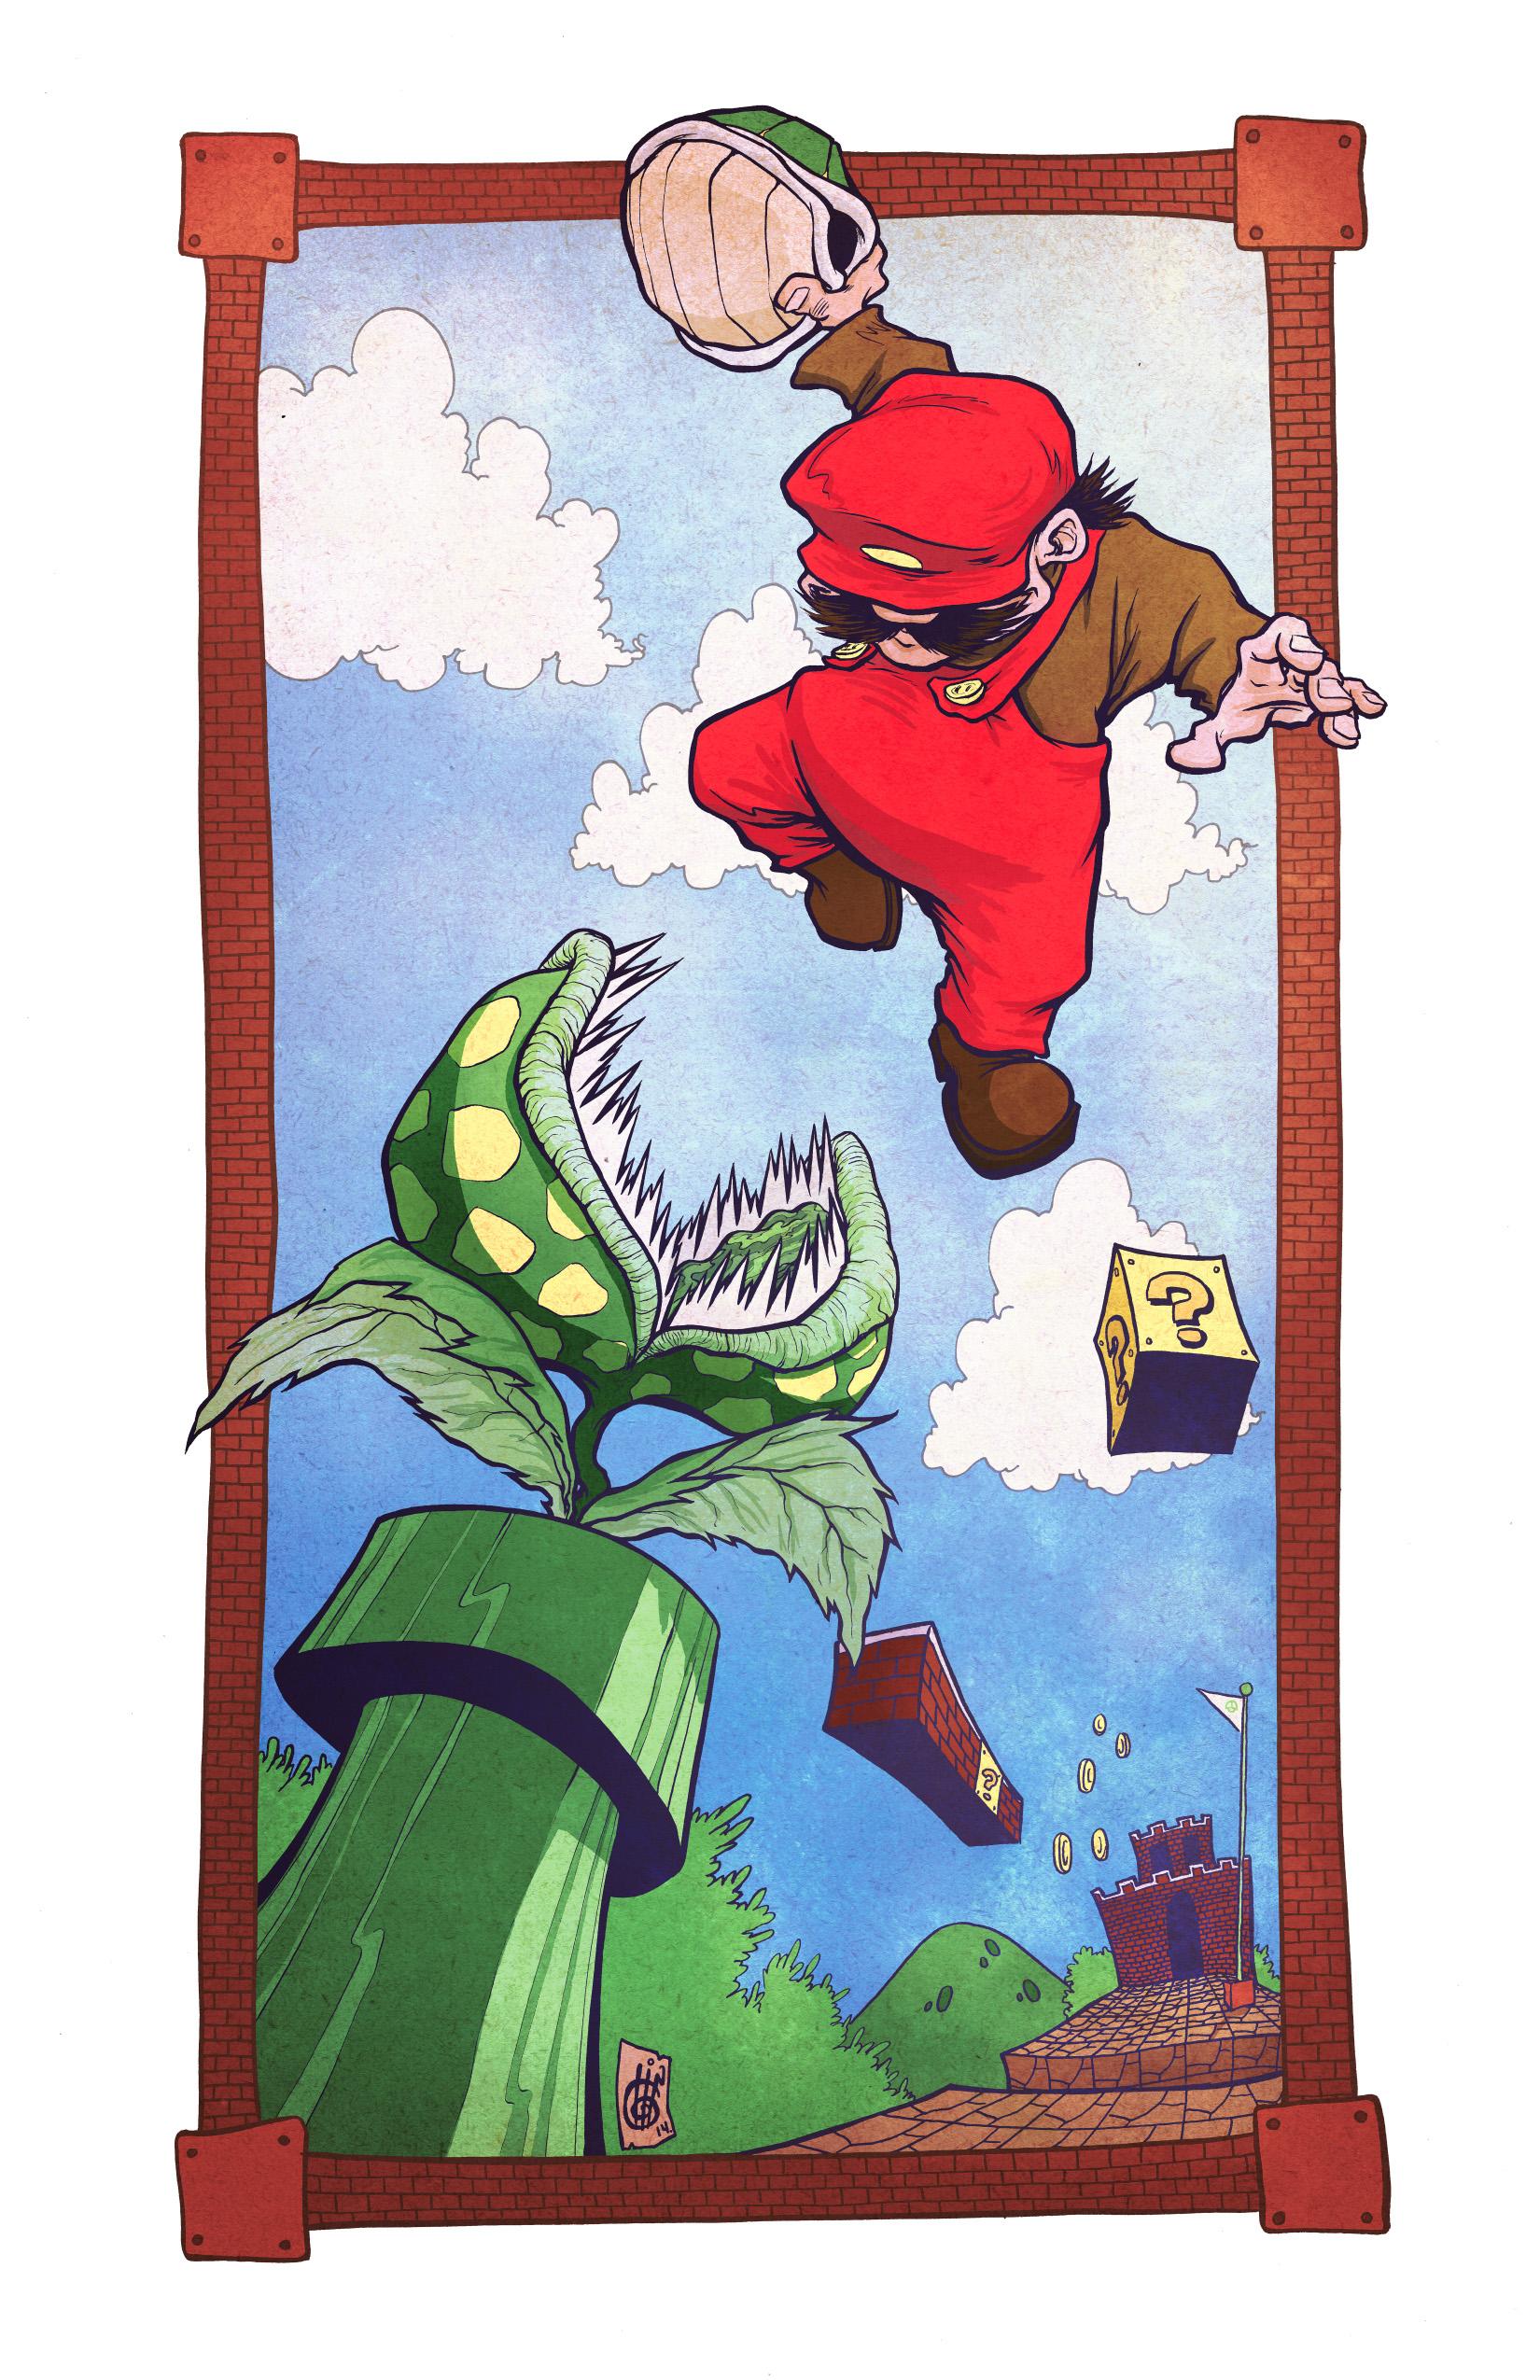 Nintendo_Mario_11x17_3.jpg